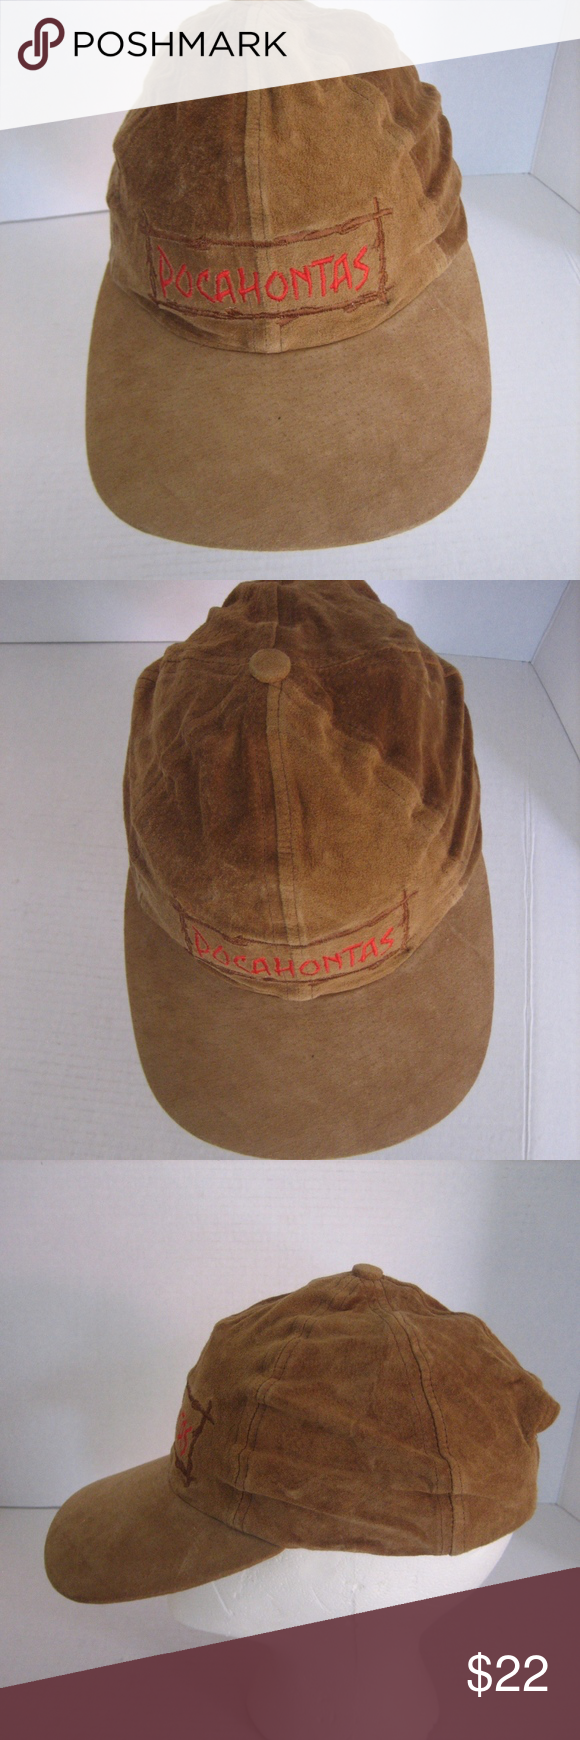 ff0769a1d1eb Disney Pocahontas Women s Tan Suede Baseball Hat Vintage Disney Pocahontas  Women s Tan Suede Baseball Hat Pre